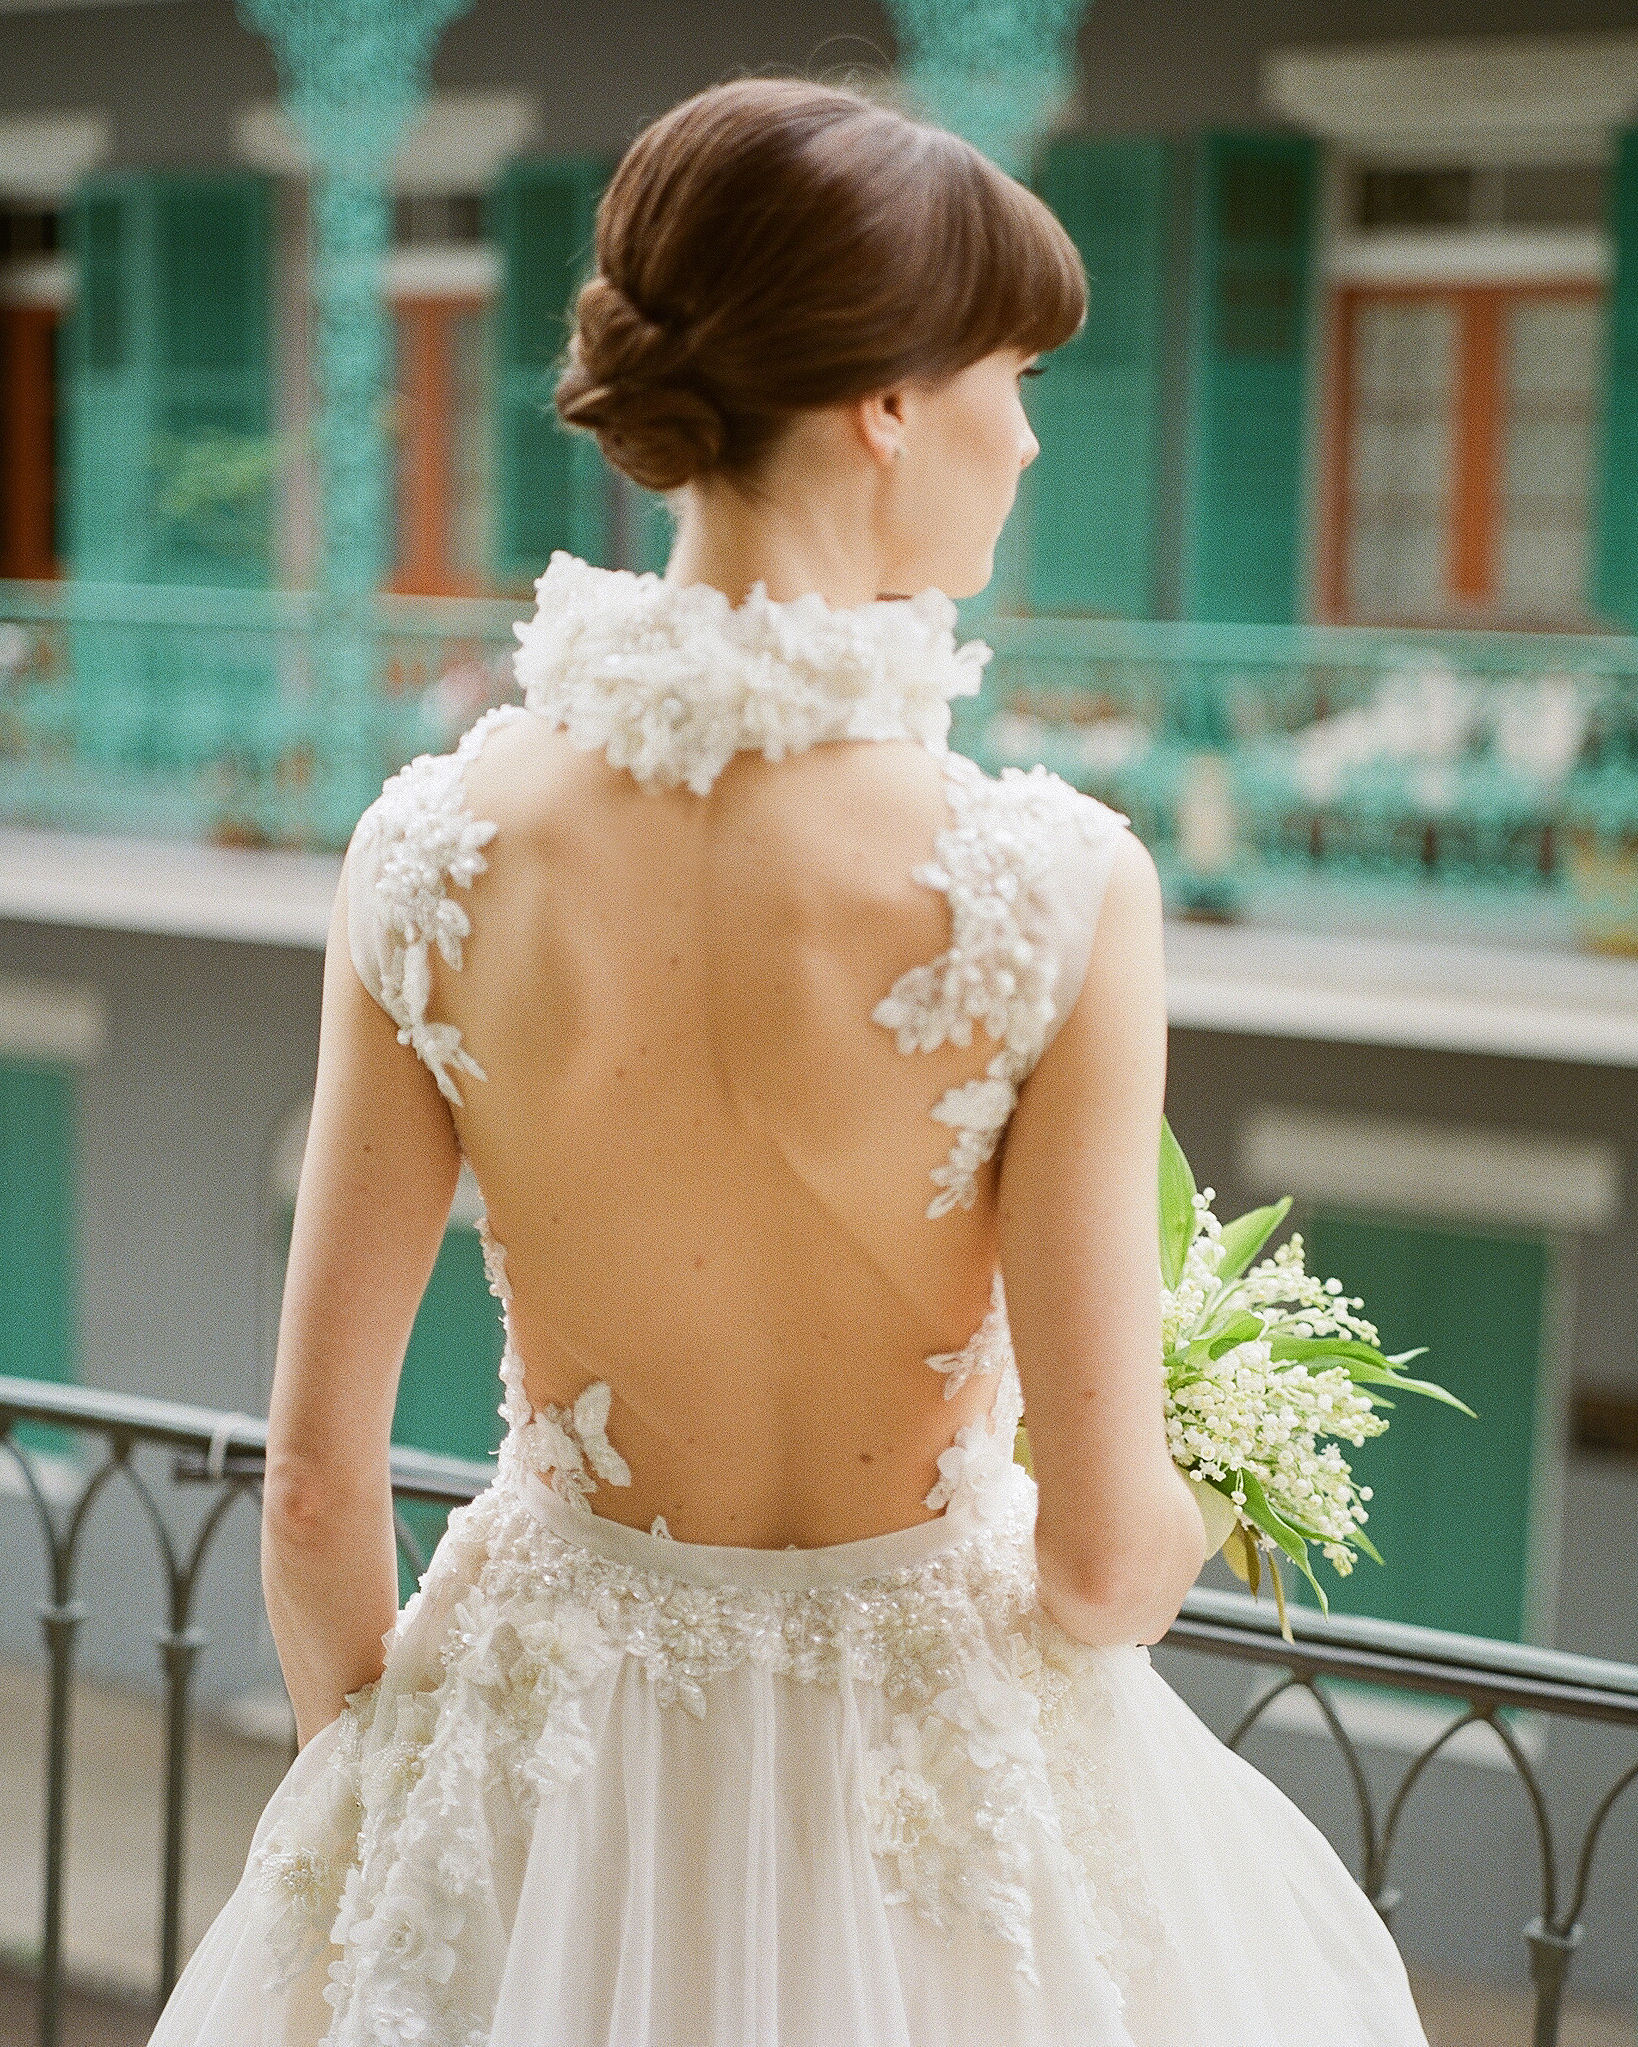 haylie brad wedding dress back